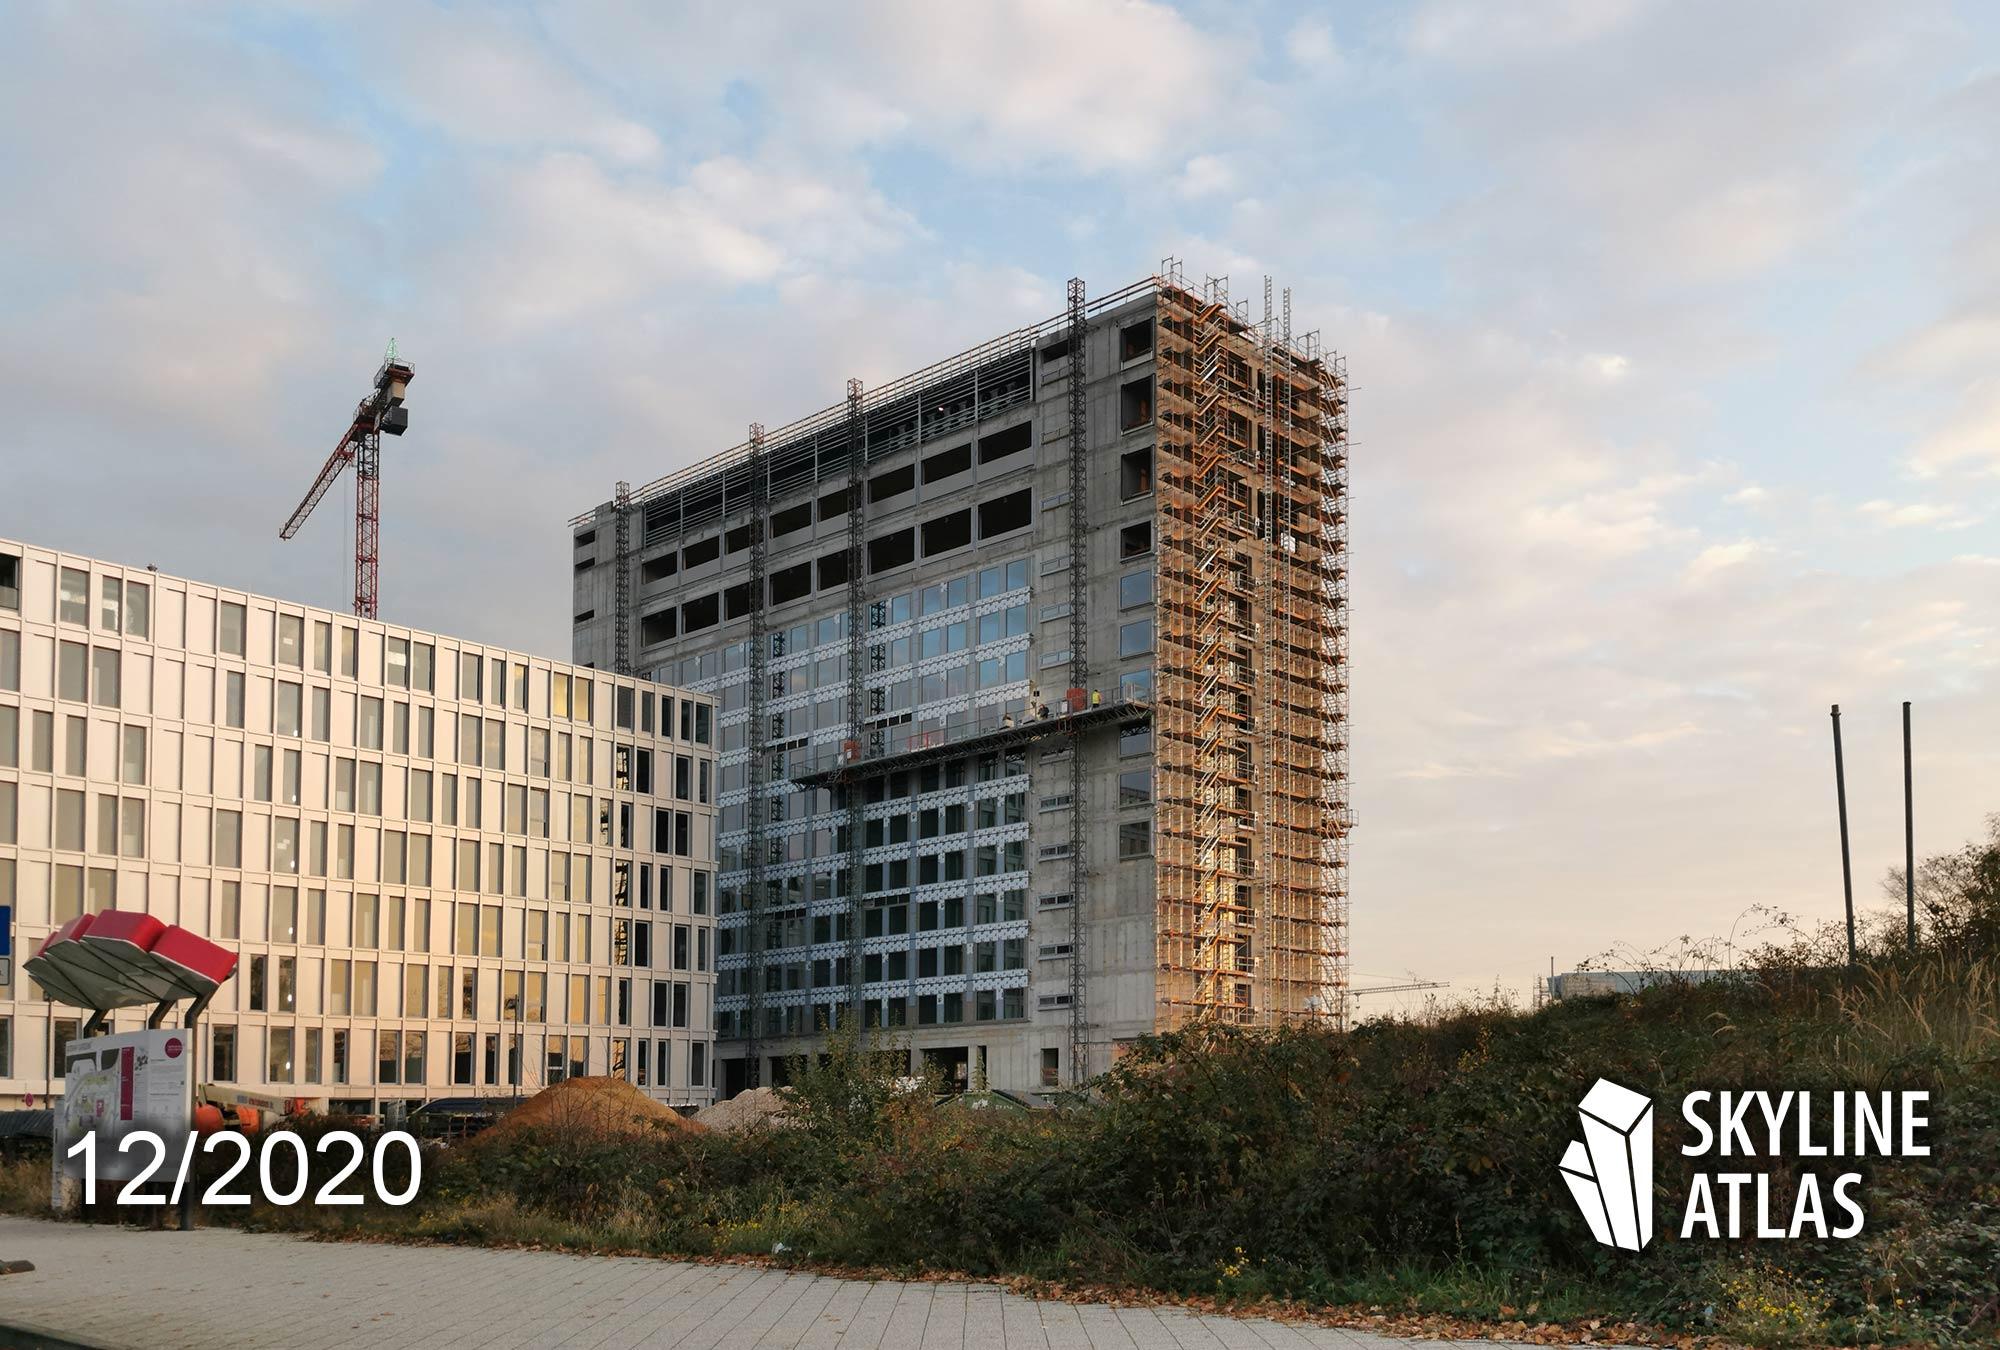 b'mine Hotel - Frankfurt Hotel Flughafen - Airport Hotel Frankfurt - Baustelle Dezember 2020